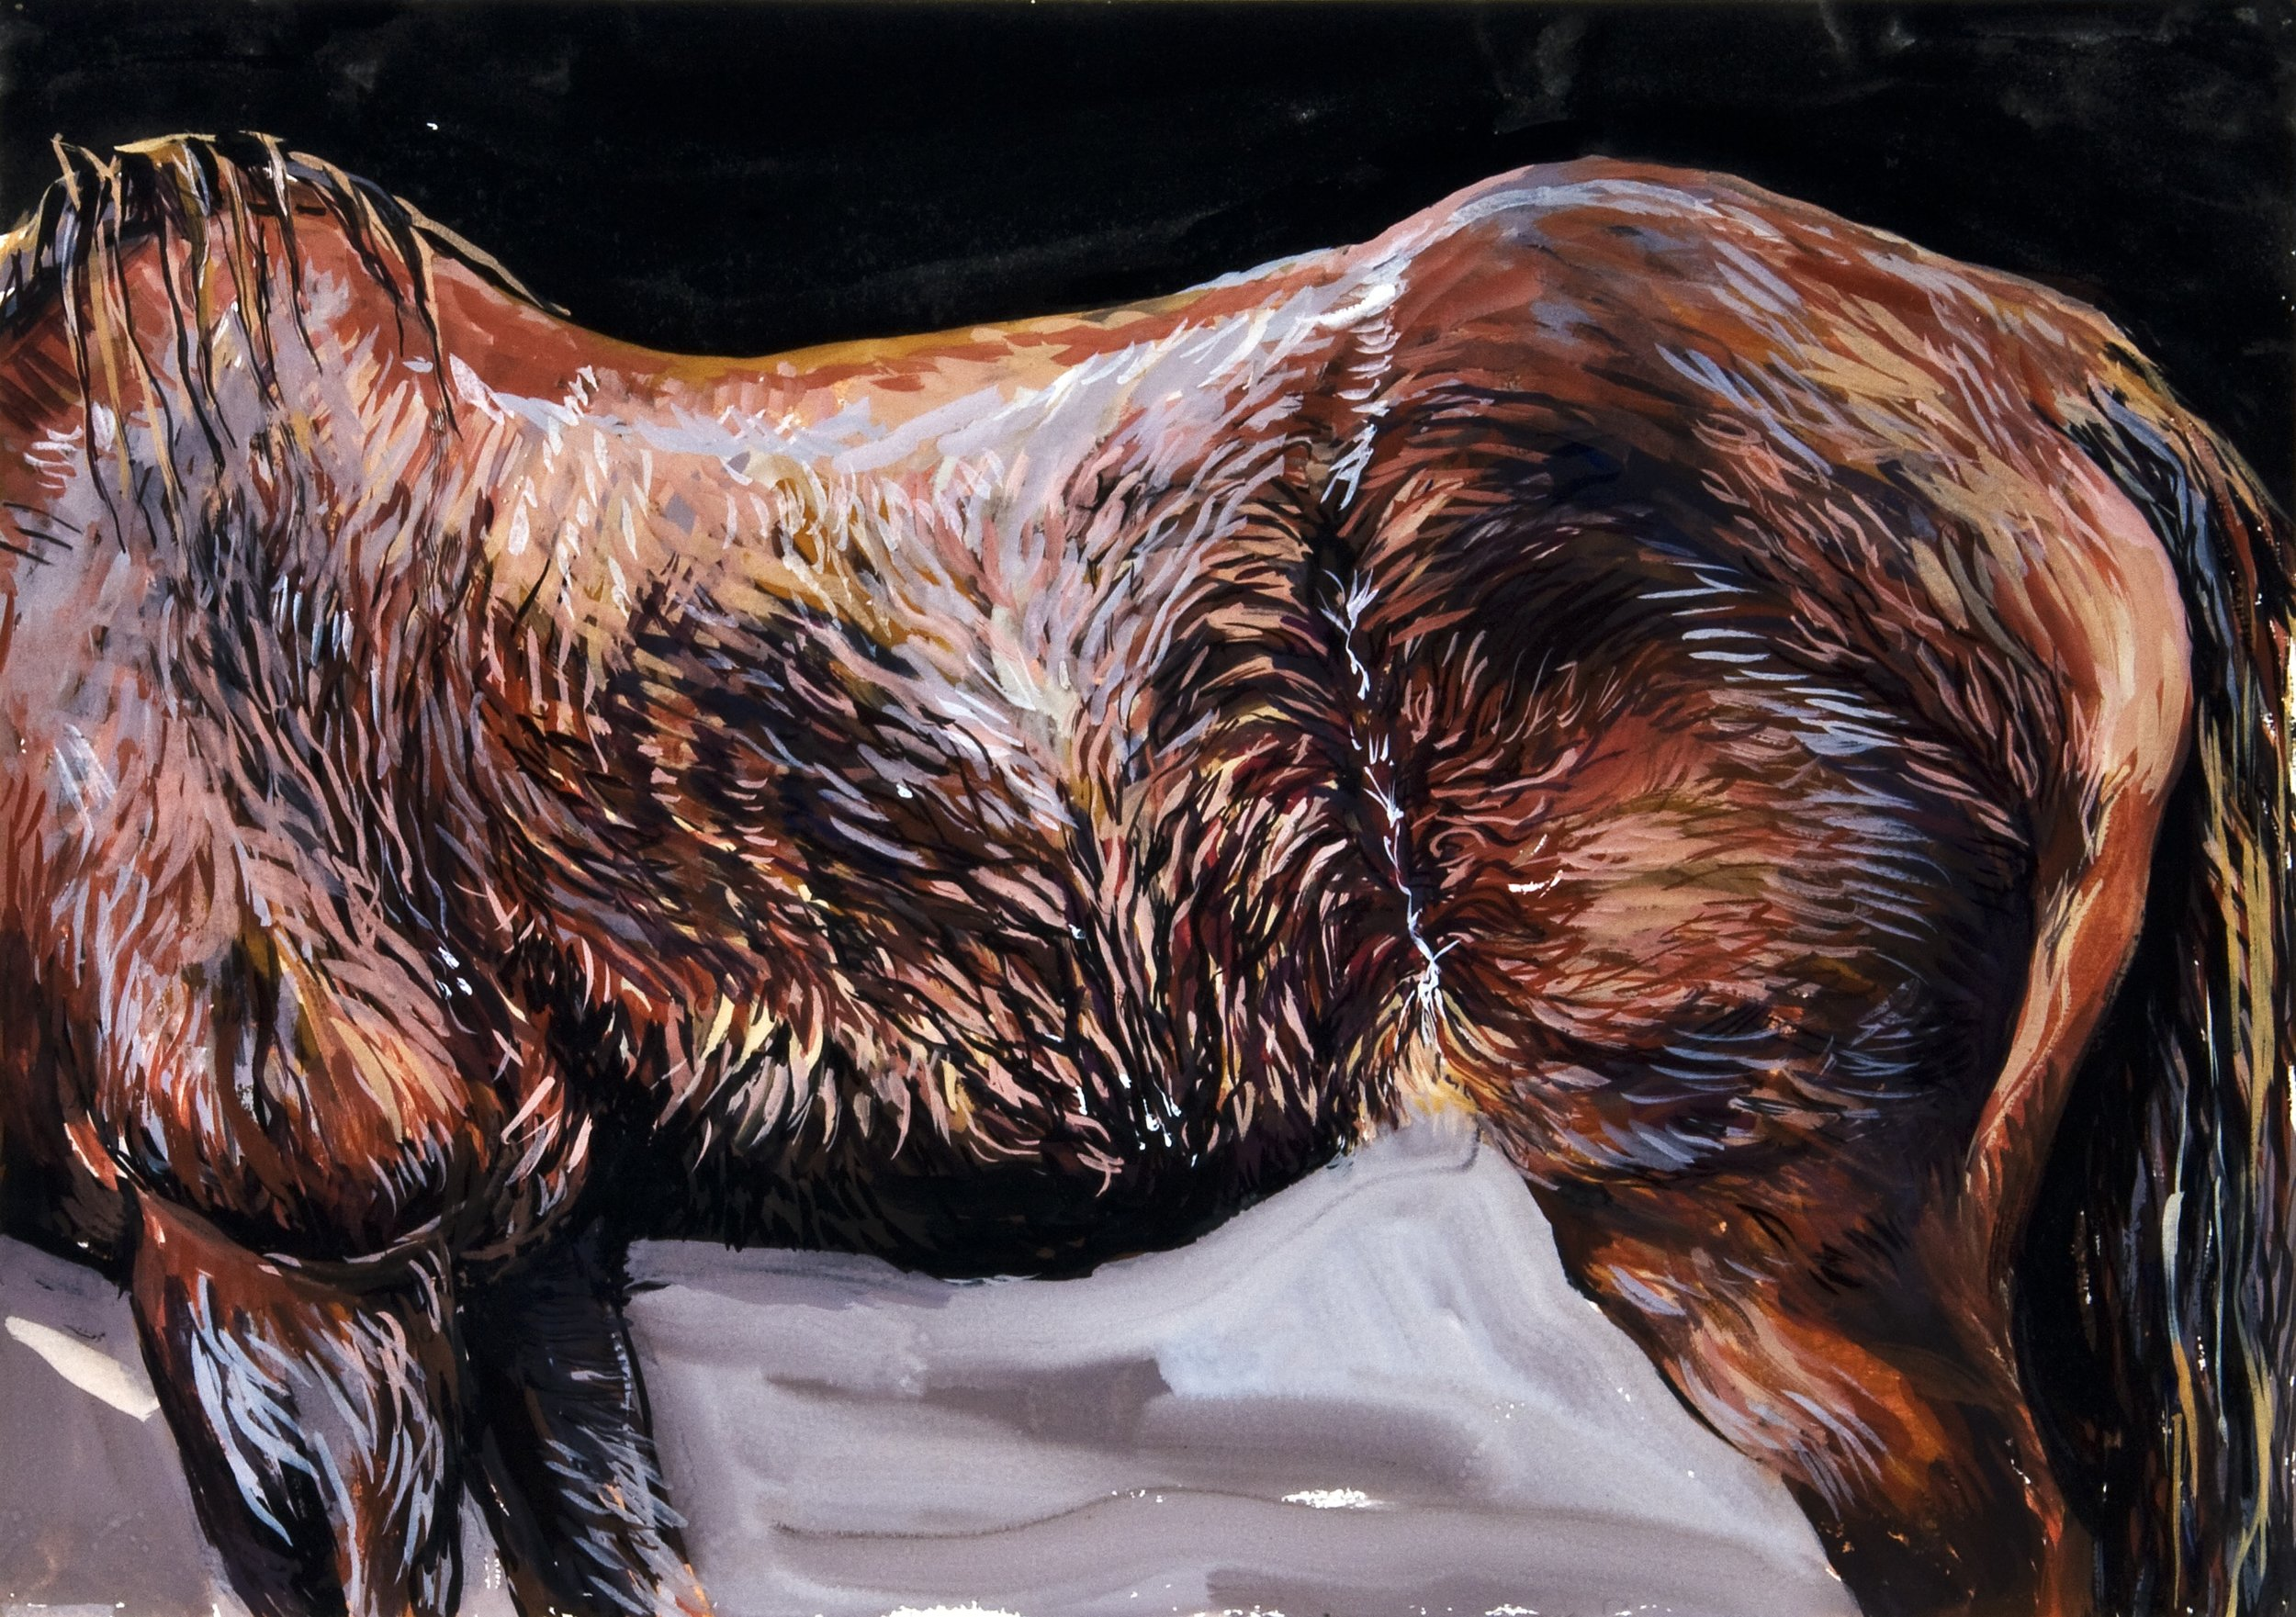 Horse in the rain , 2011, gouache on rag paper, 29cm x 41cm